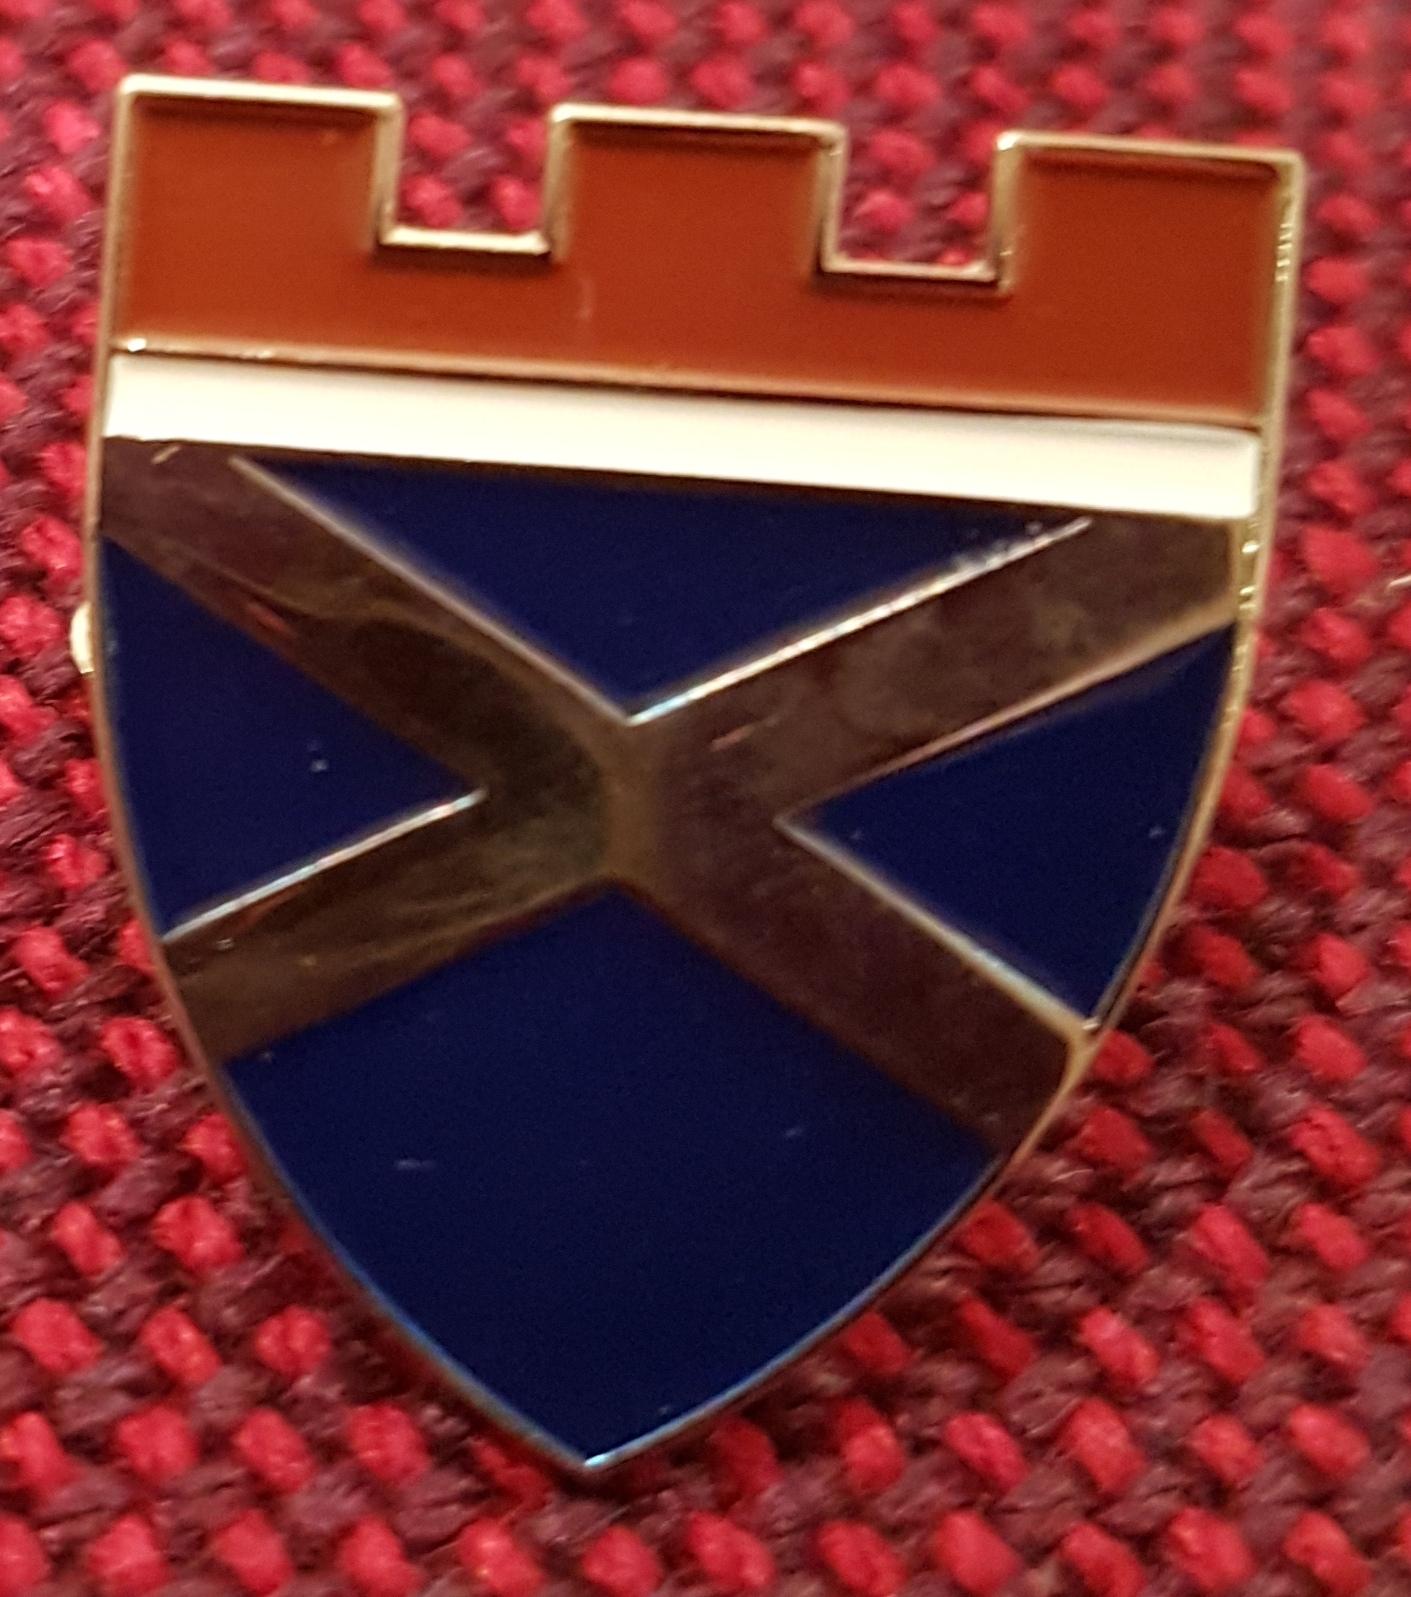 The Highland Military Tattoo Badge